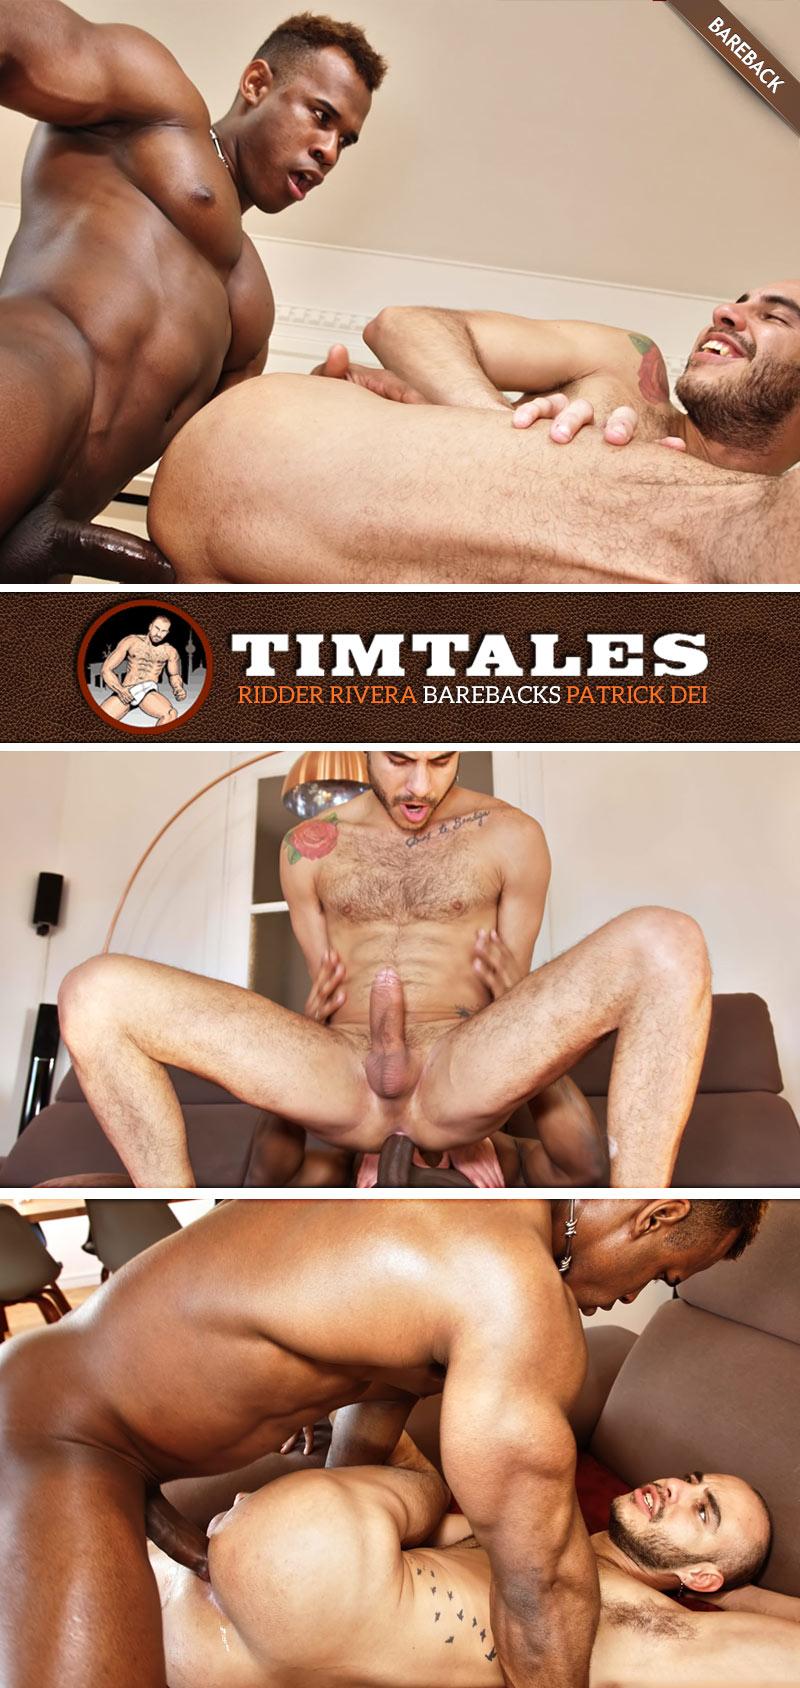 Ridder Rivera Barebacks Patrick Dei at TimTales